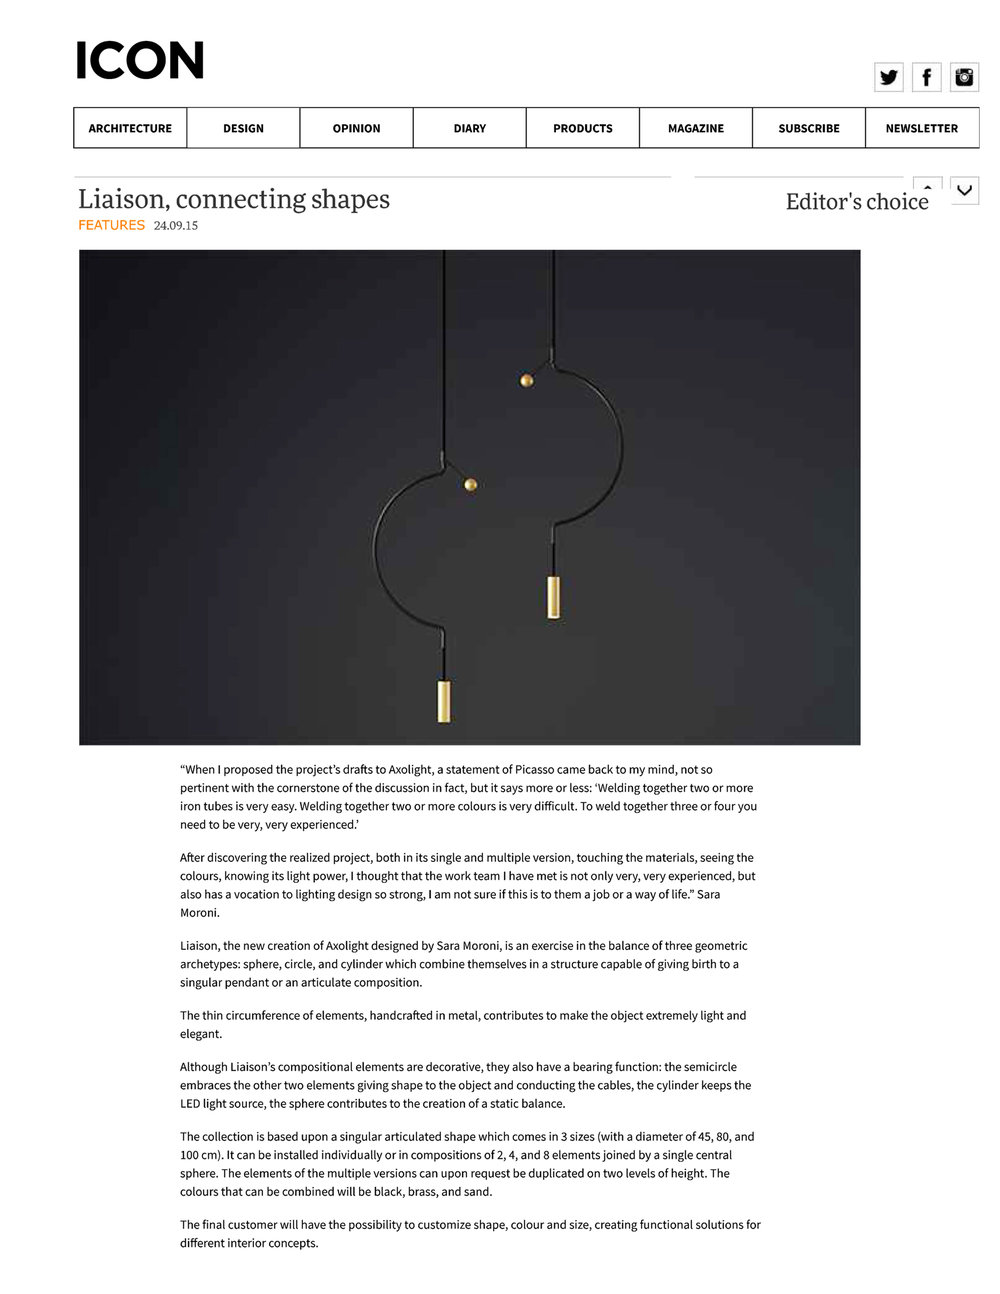 Iconeye | Liaison, connecting shapes